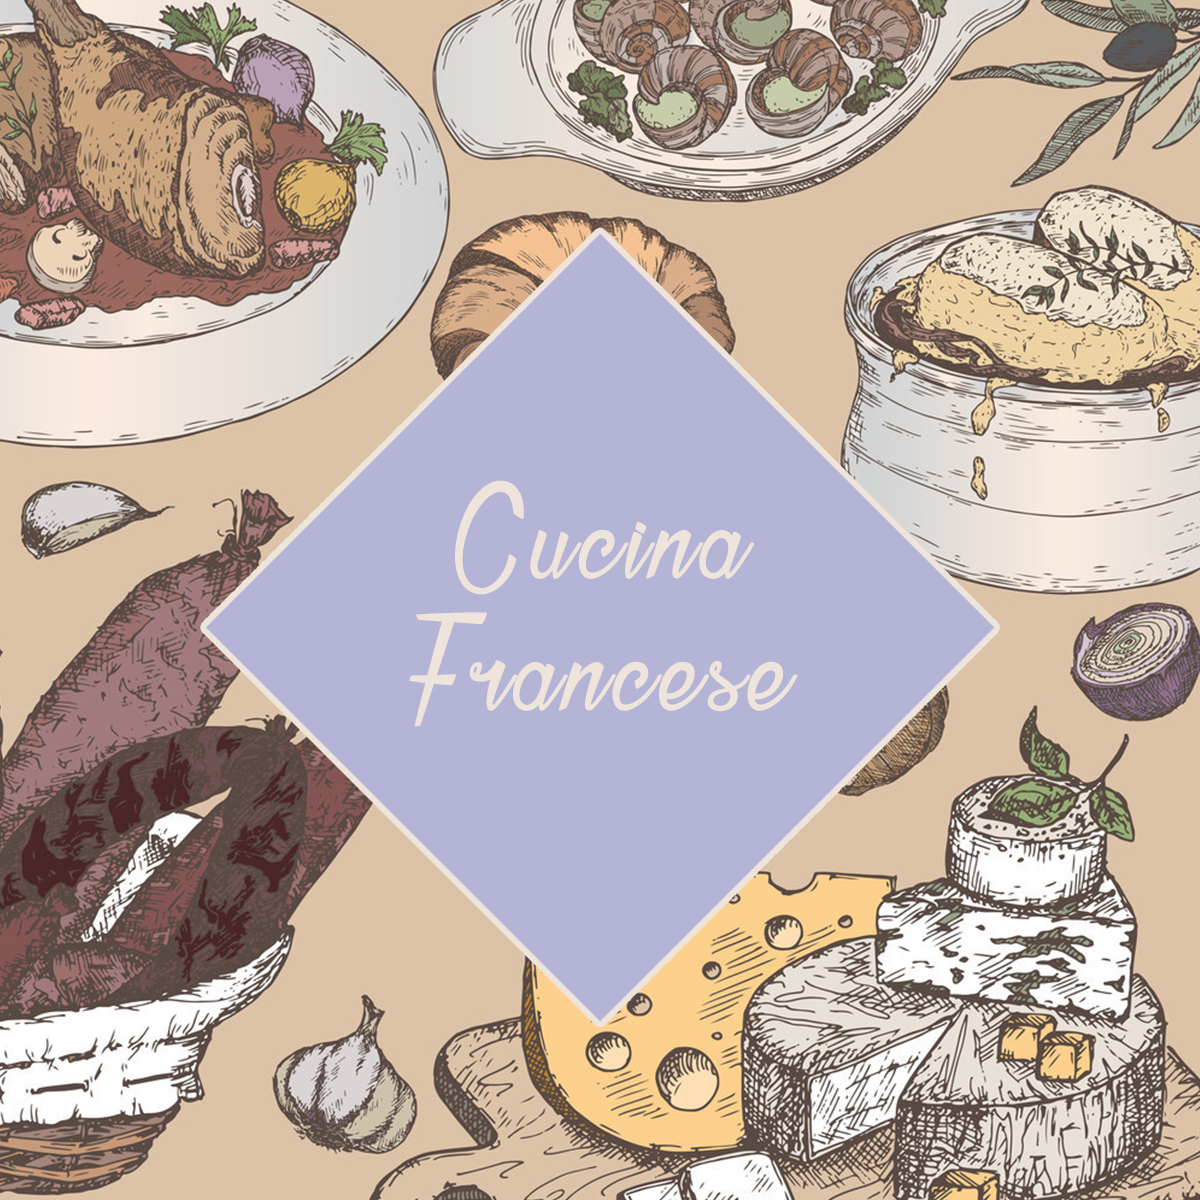 La cucina francese